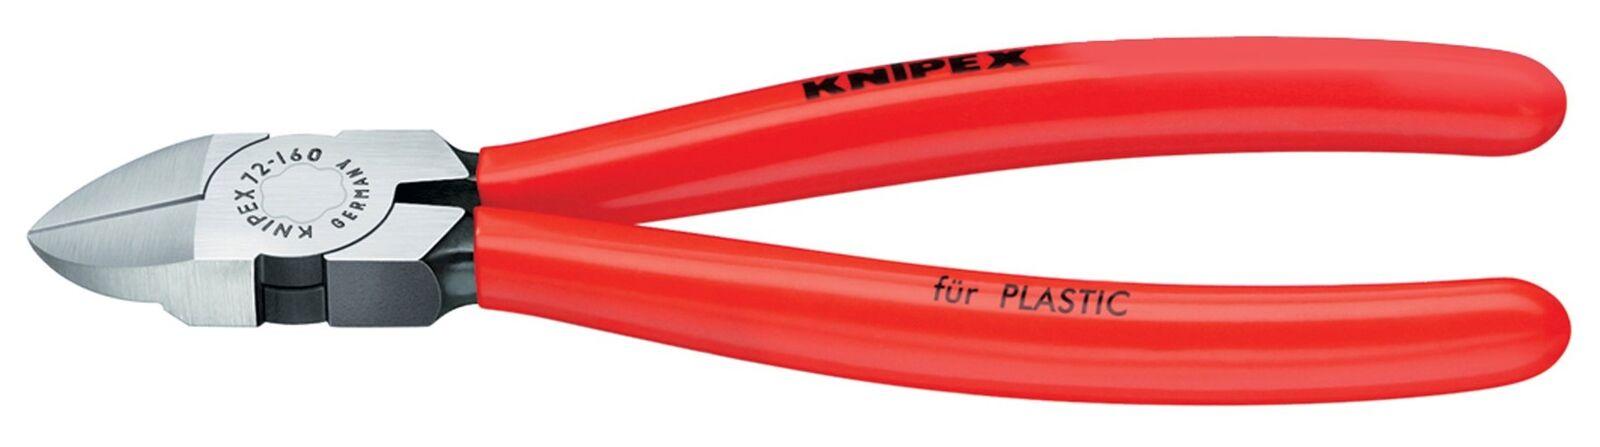 KNIPEX 72 01 180 Diagonal Flush Cutters